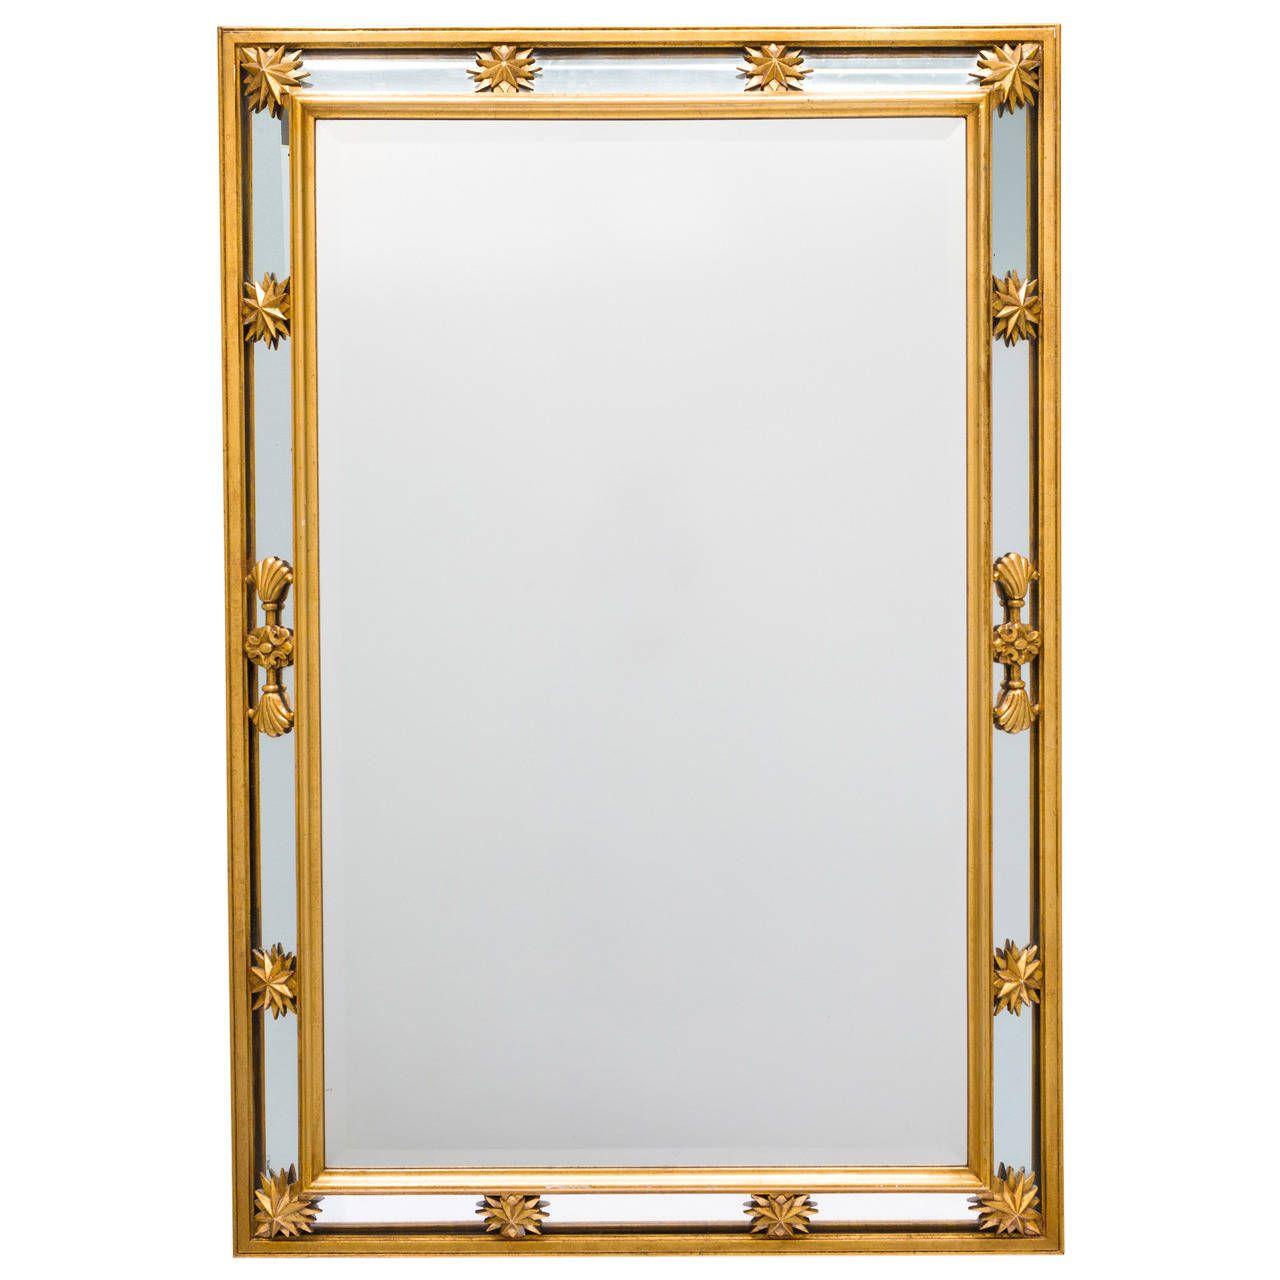 Neoclassical Style Star Mirror | Mirror, Modern mirror wall, Mirror decor